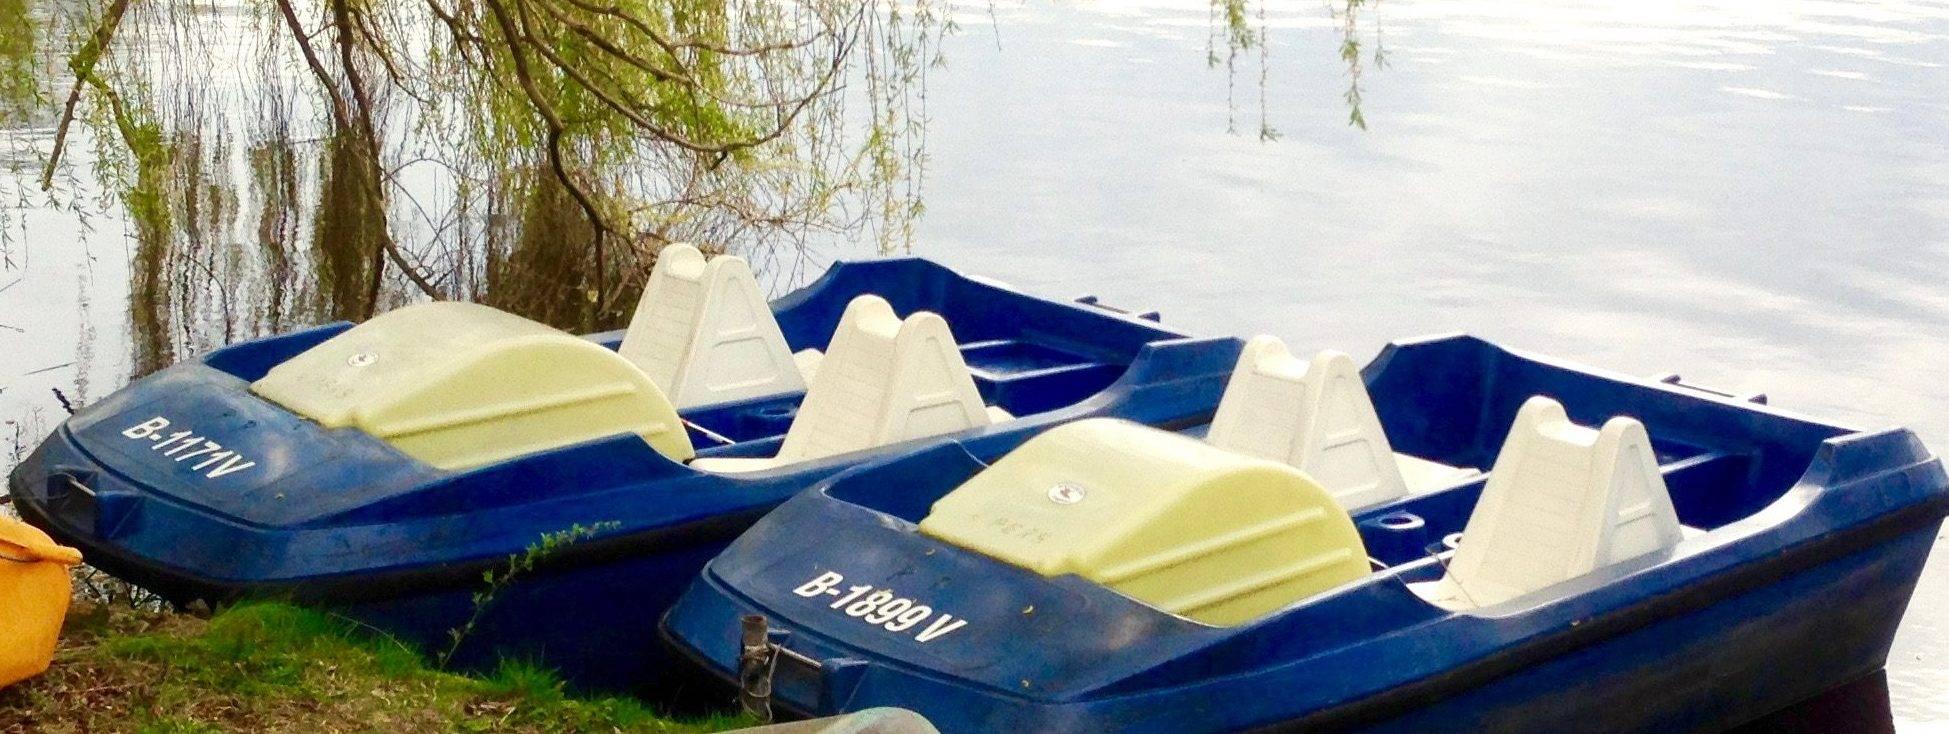 Tretboot leihen bei Berlin Bootsverleih Paddel Pit am Motzener See